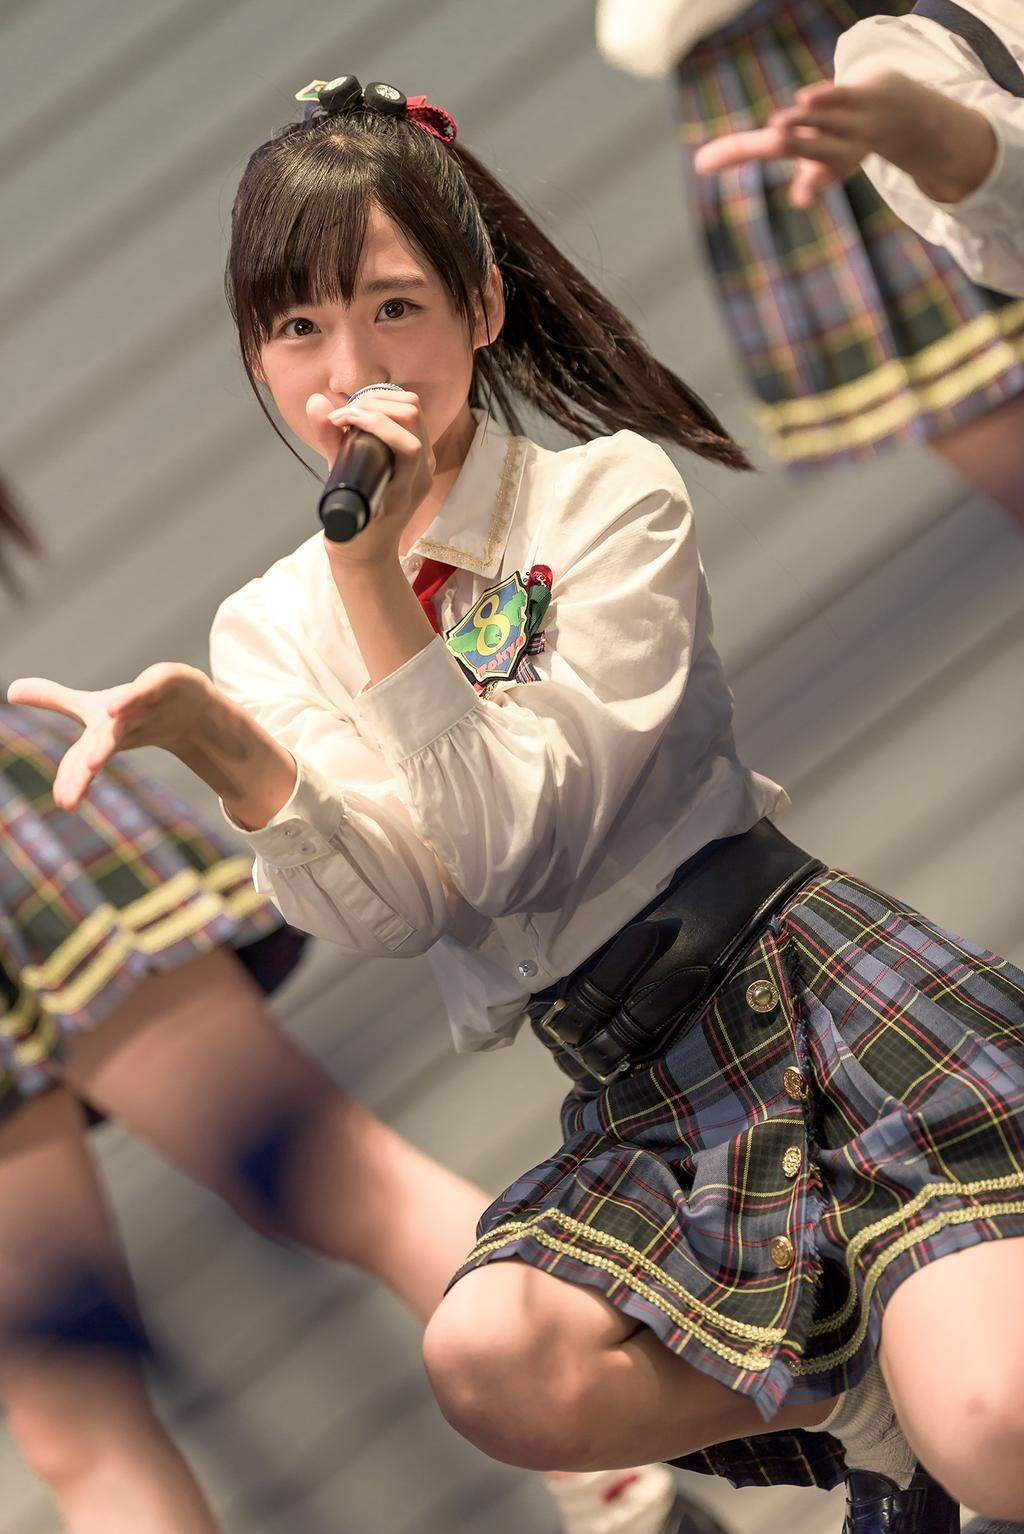 "AKB48 チーム8 エロ画像 ""【AKB48】チーム8の小栗有以ちゃんめっちゃ可愛くね??【画像有り】 - http://t.co/RCuKiWBweO"""